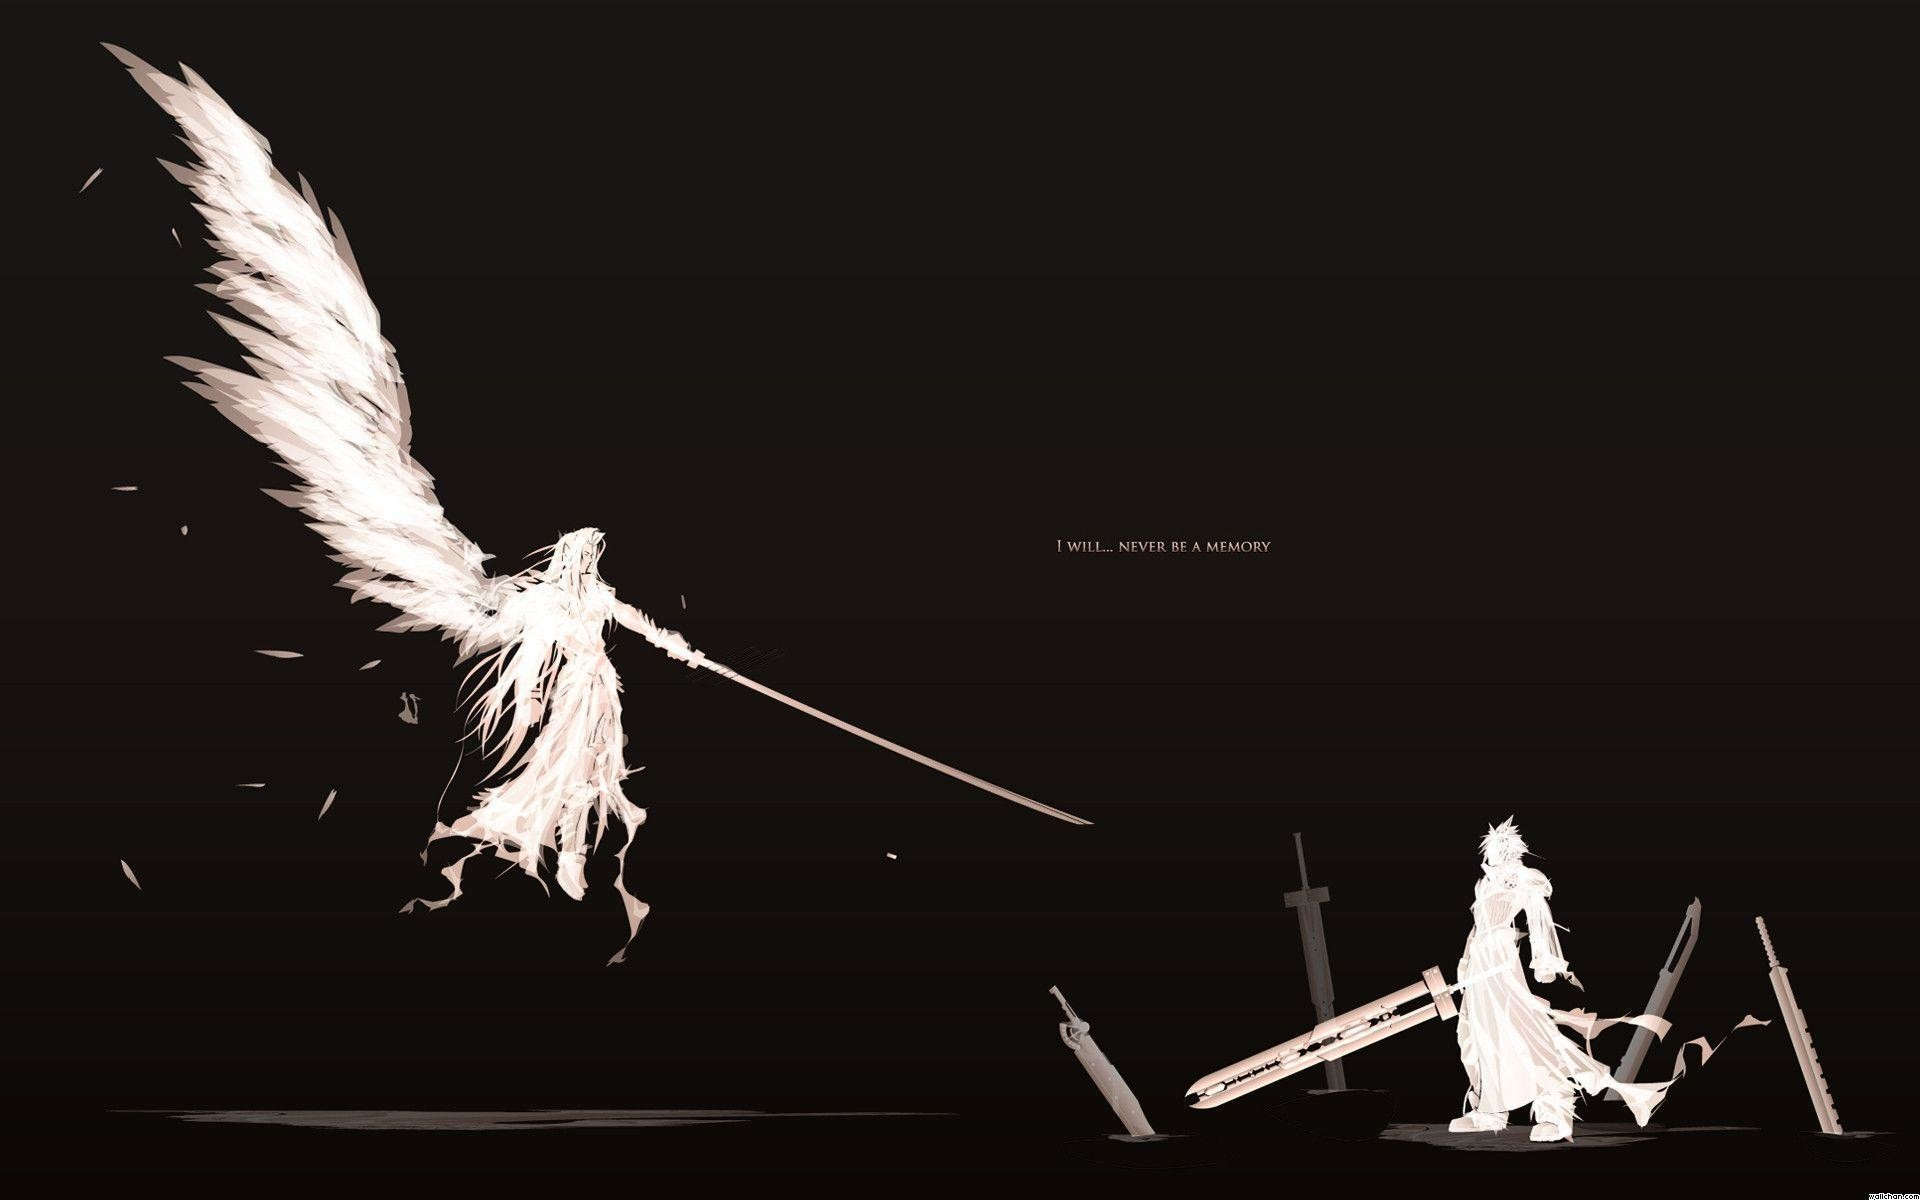 Sephiroth wallpaper – 653442